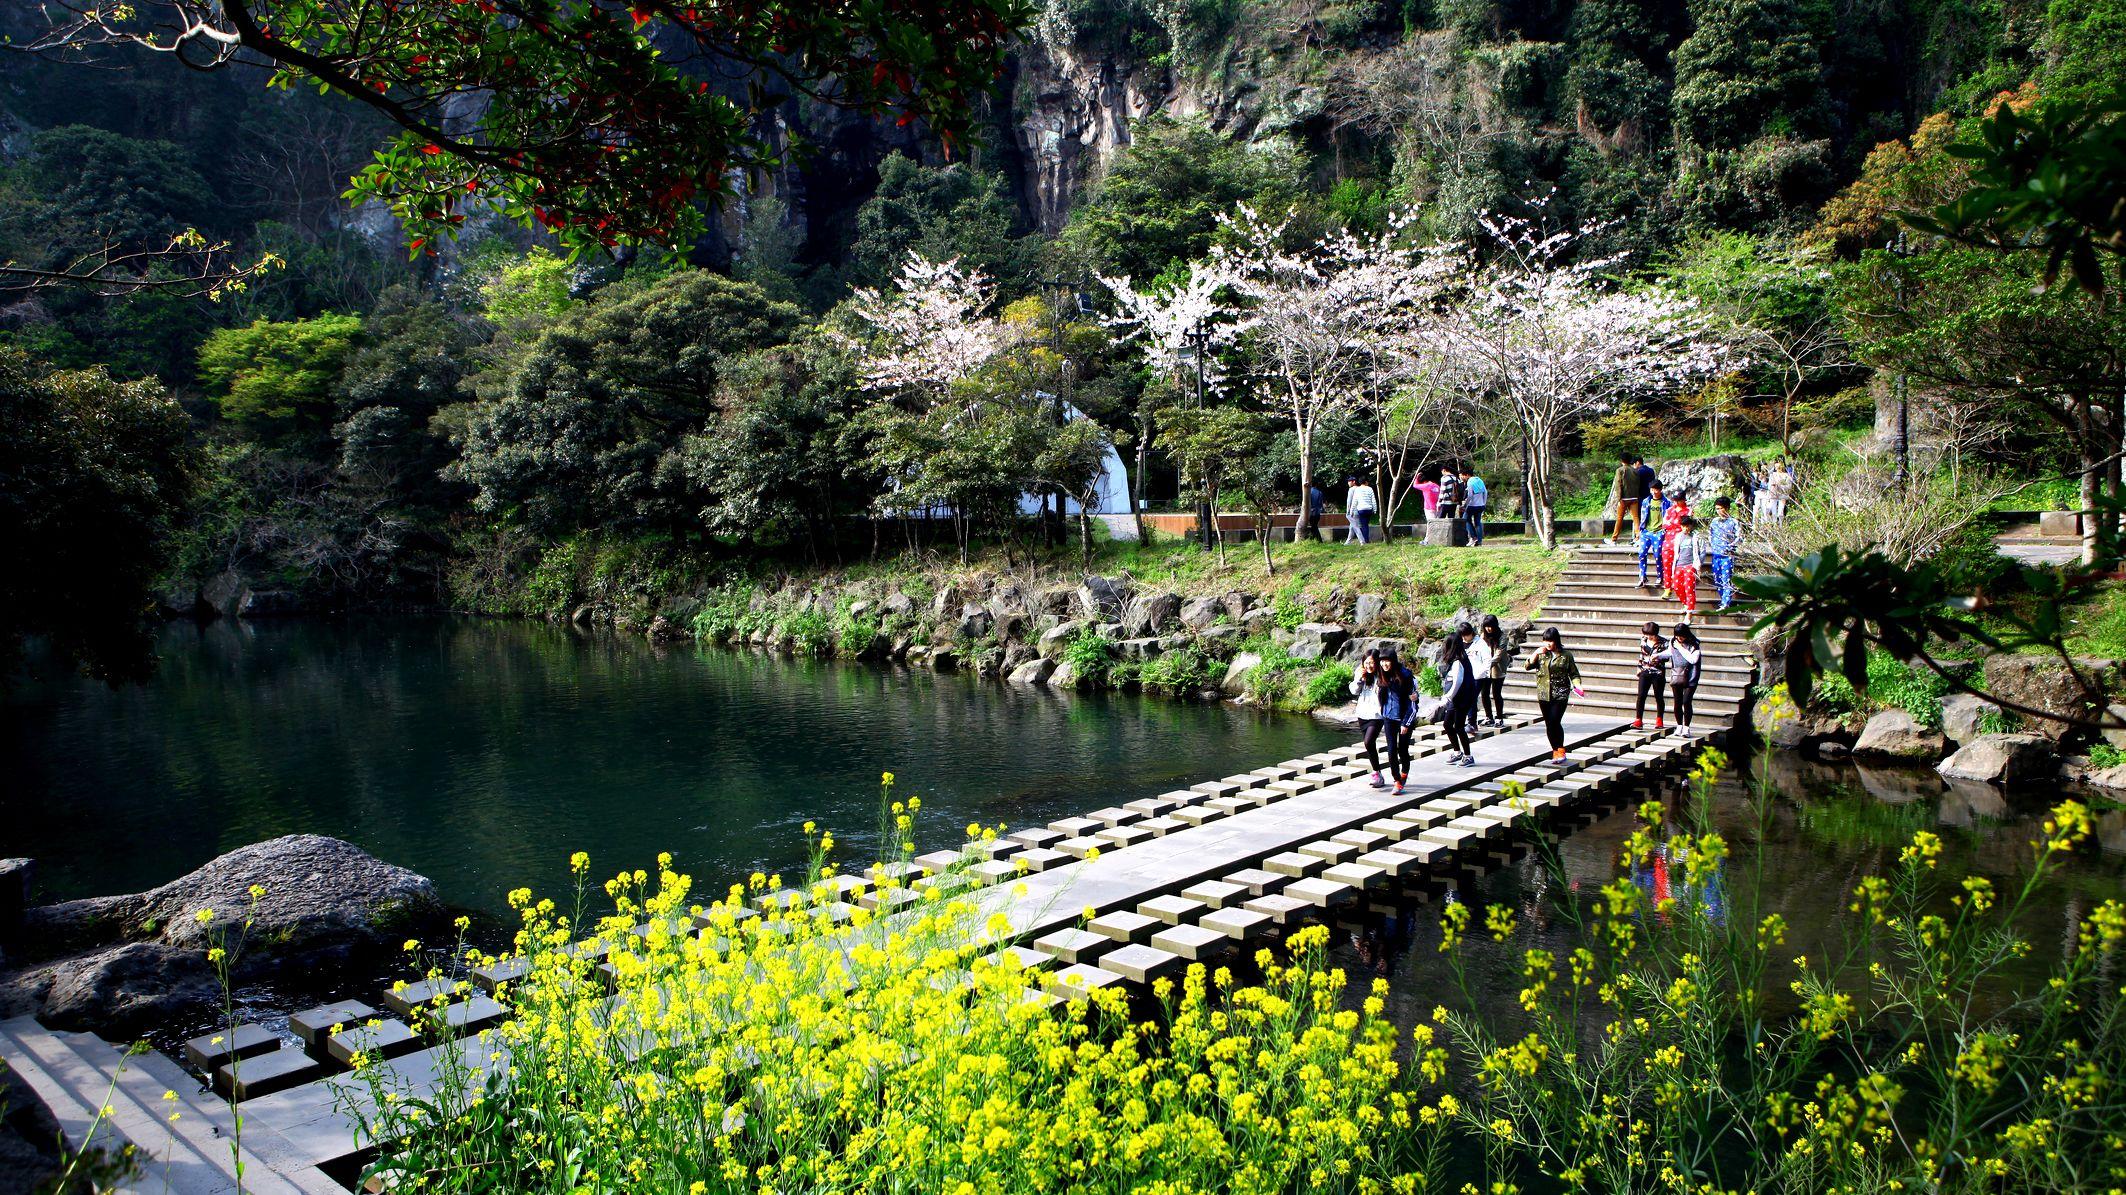 2-Day Jeju Island Tour to Folk Village, Cave & Sunrise Peak